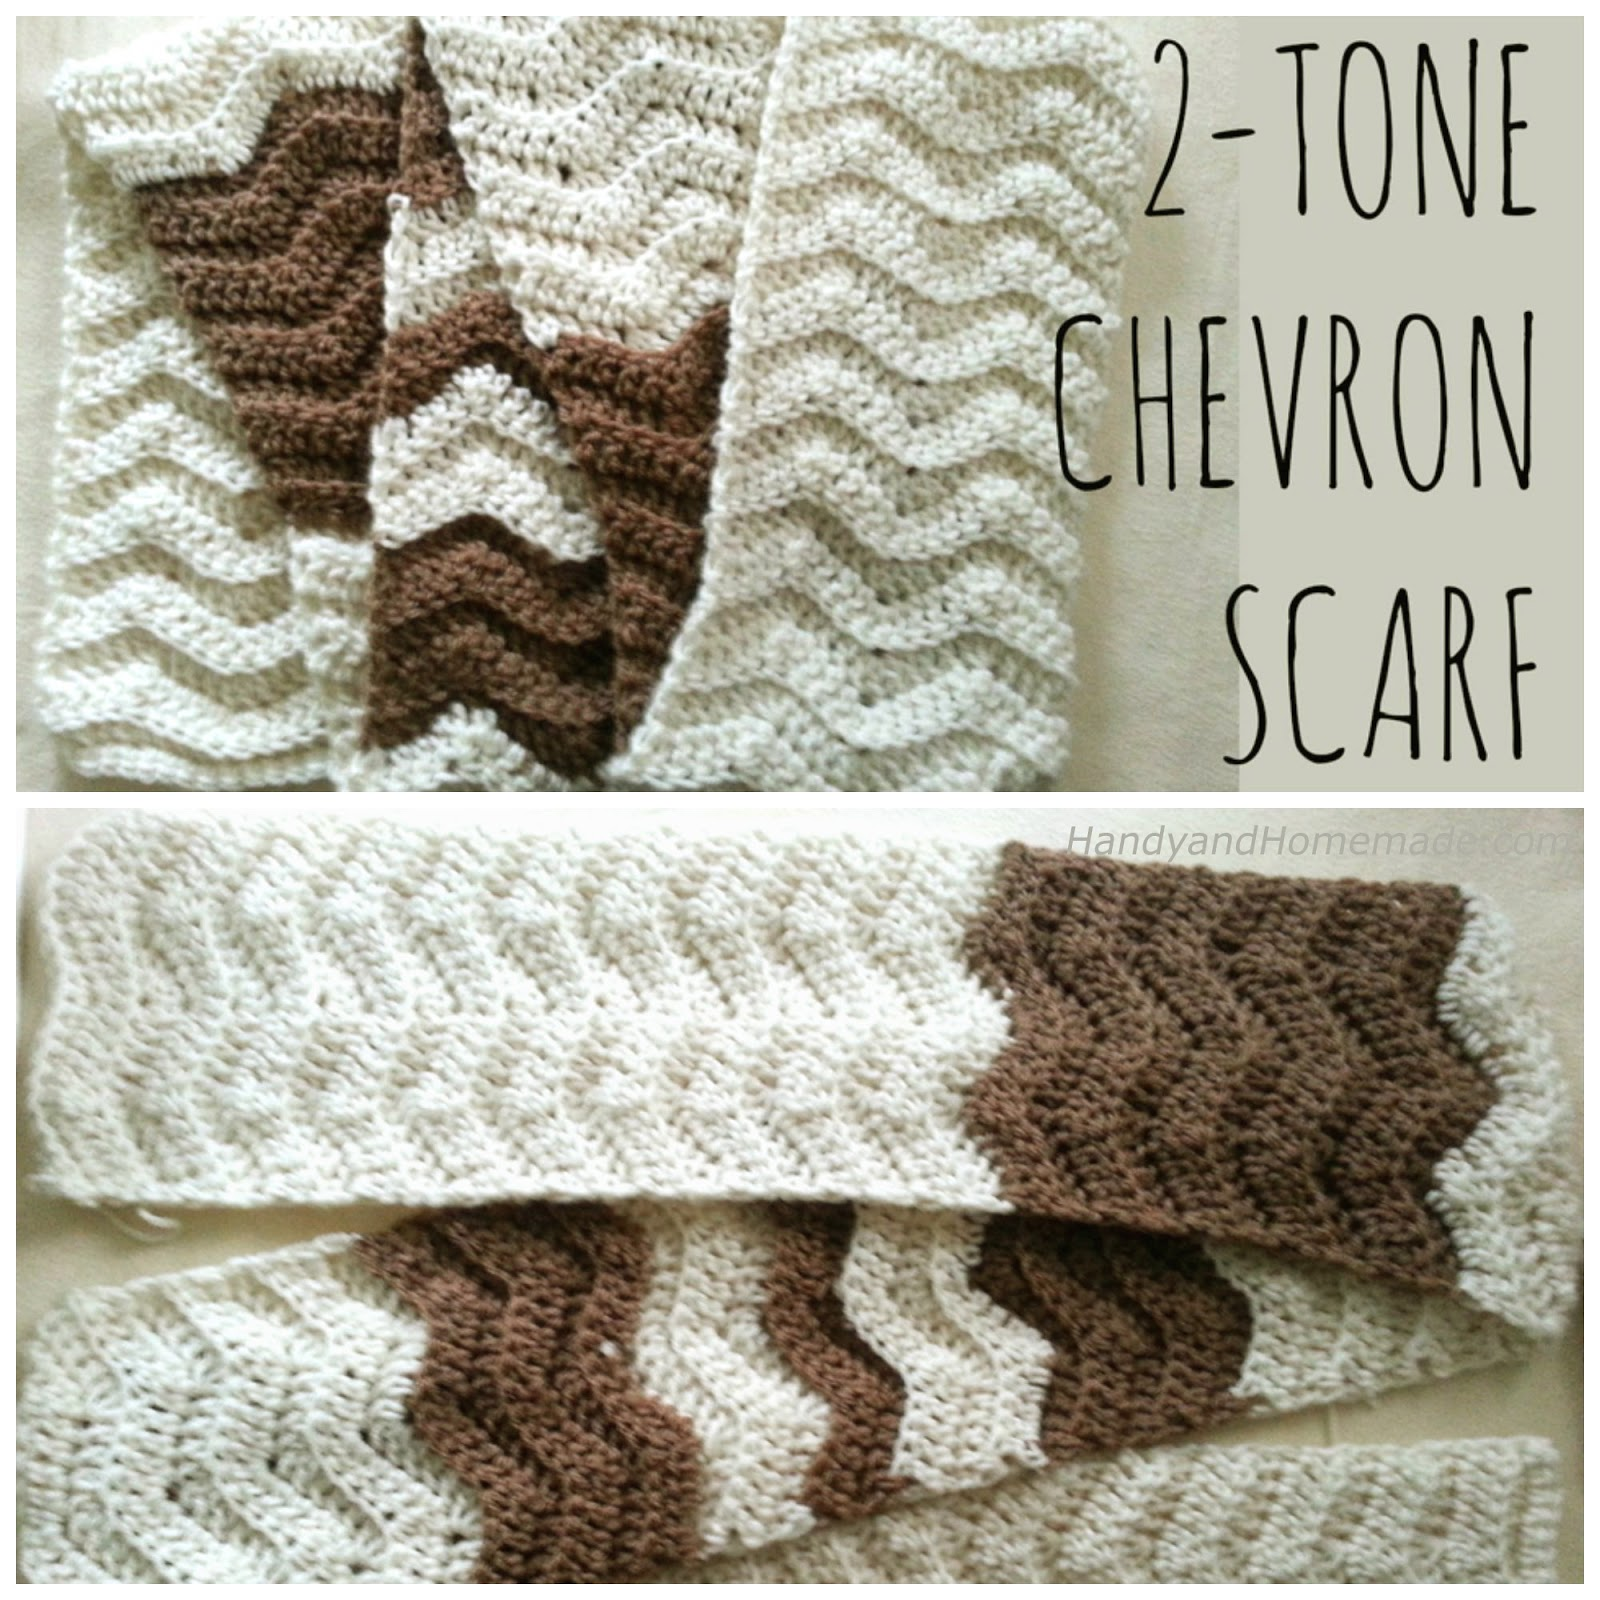 2-Tone Chevron Scarf Crochet Pattern | Handy & Homemade